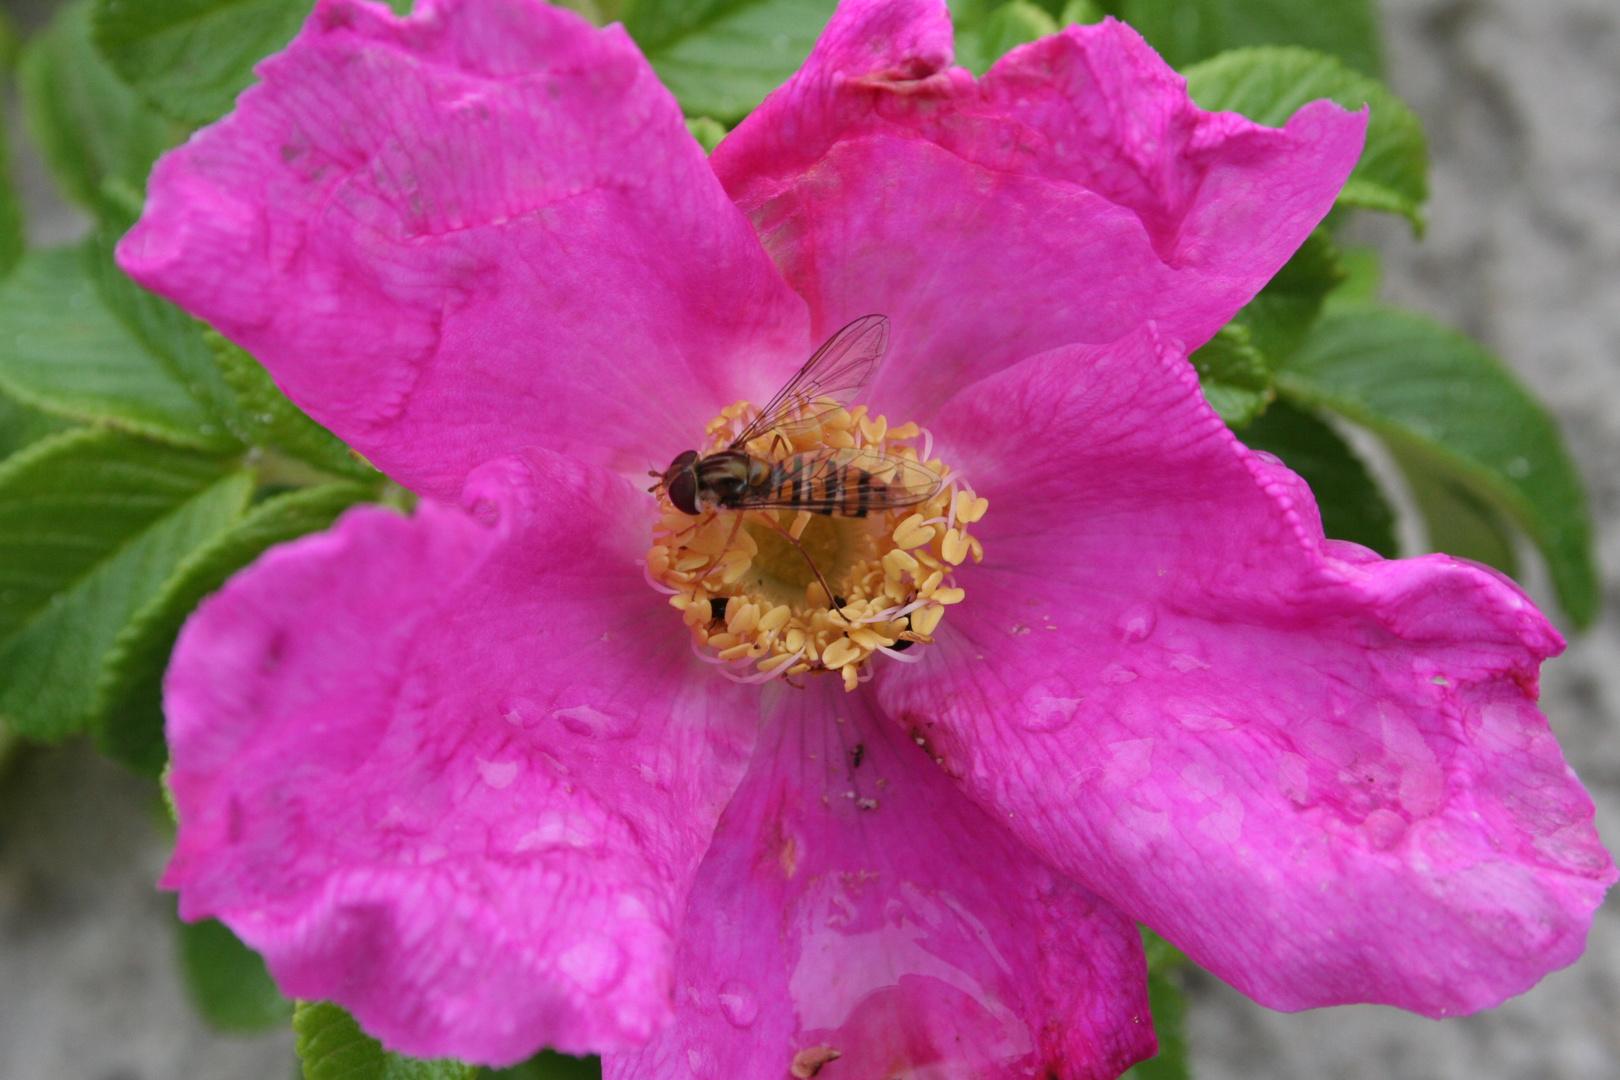 Runzelrose (Rosa rugosa)